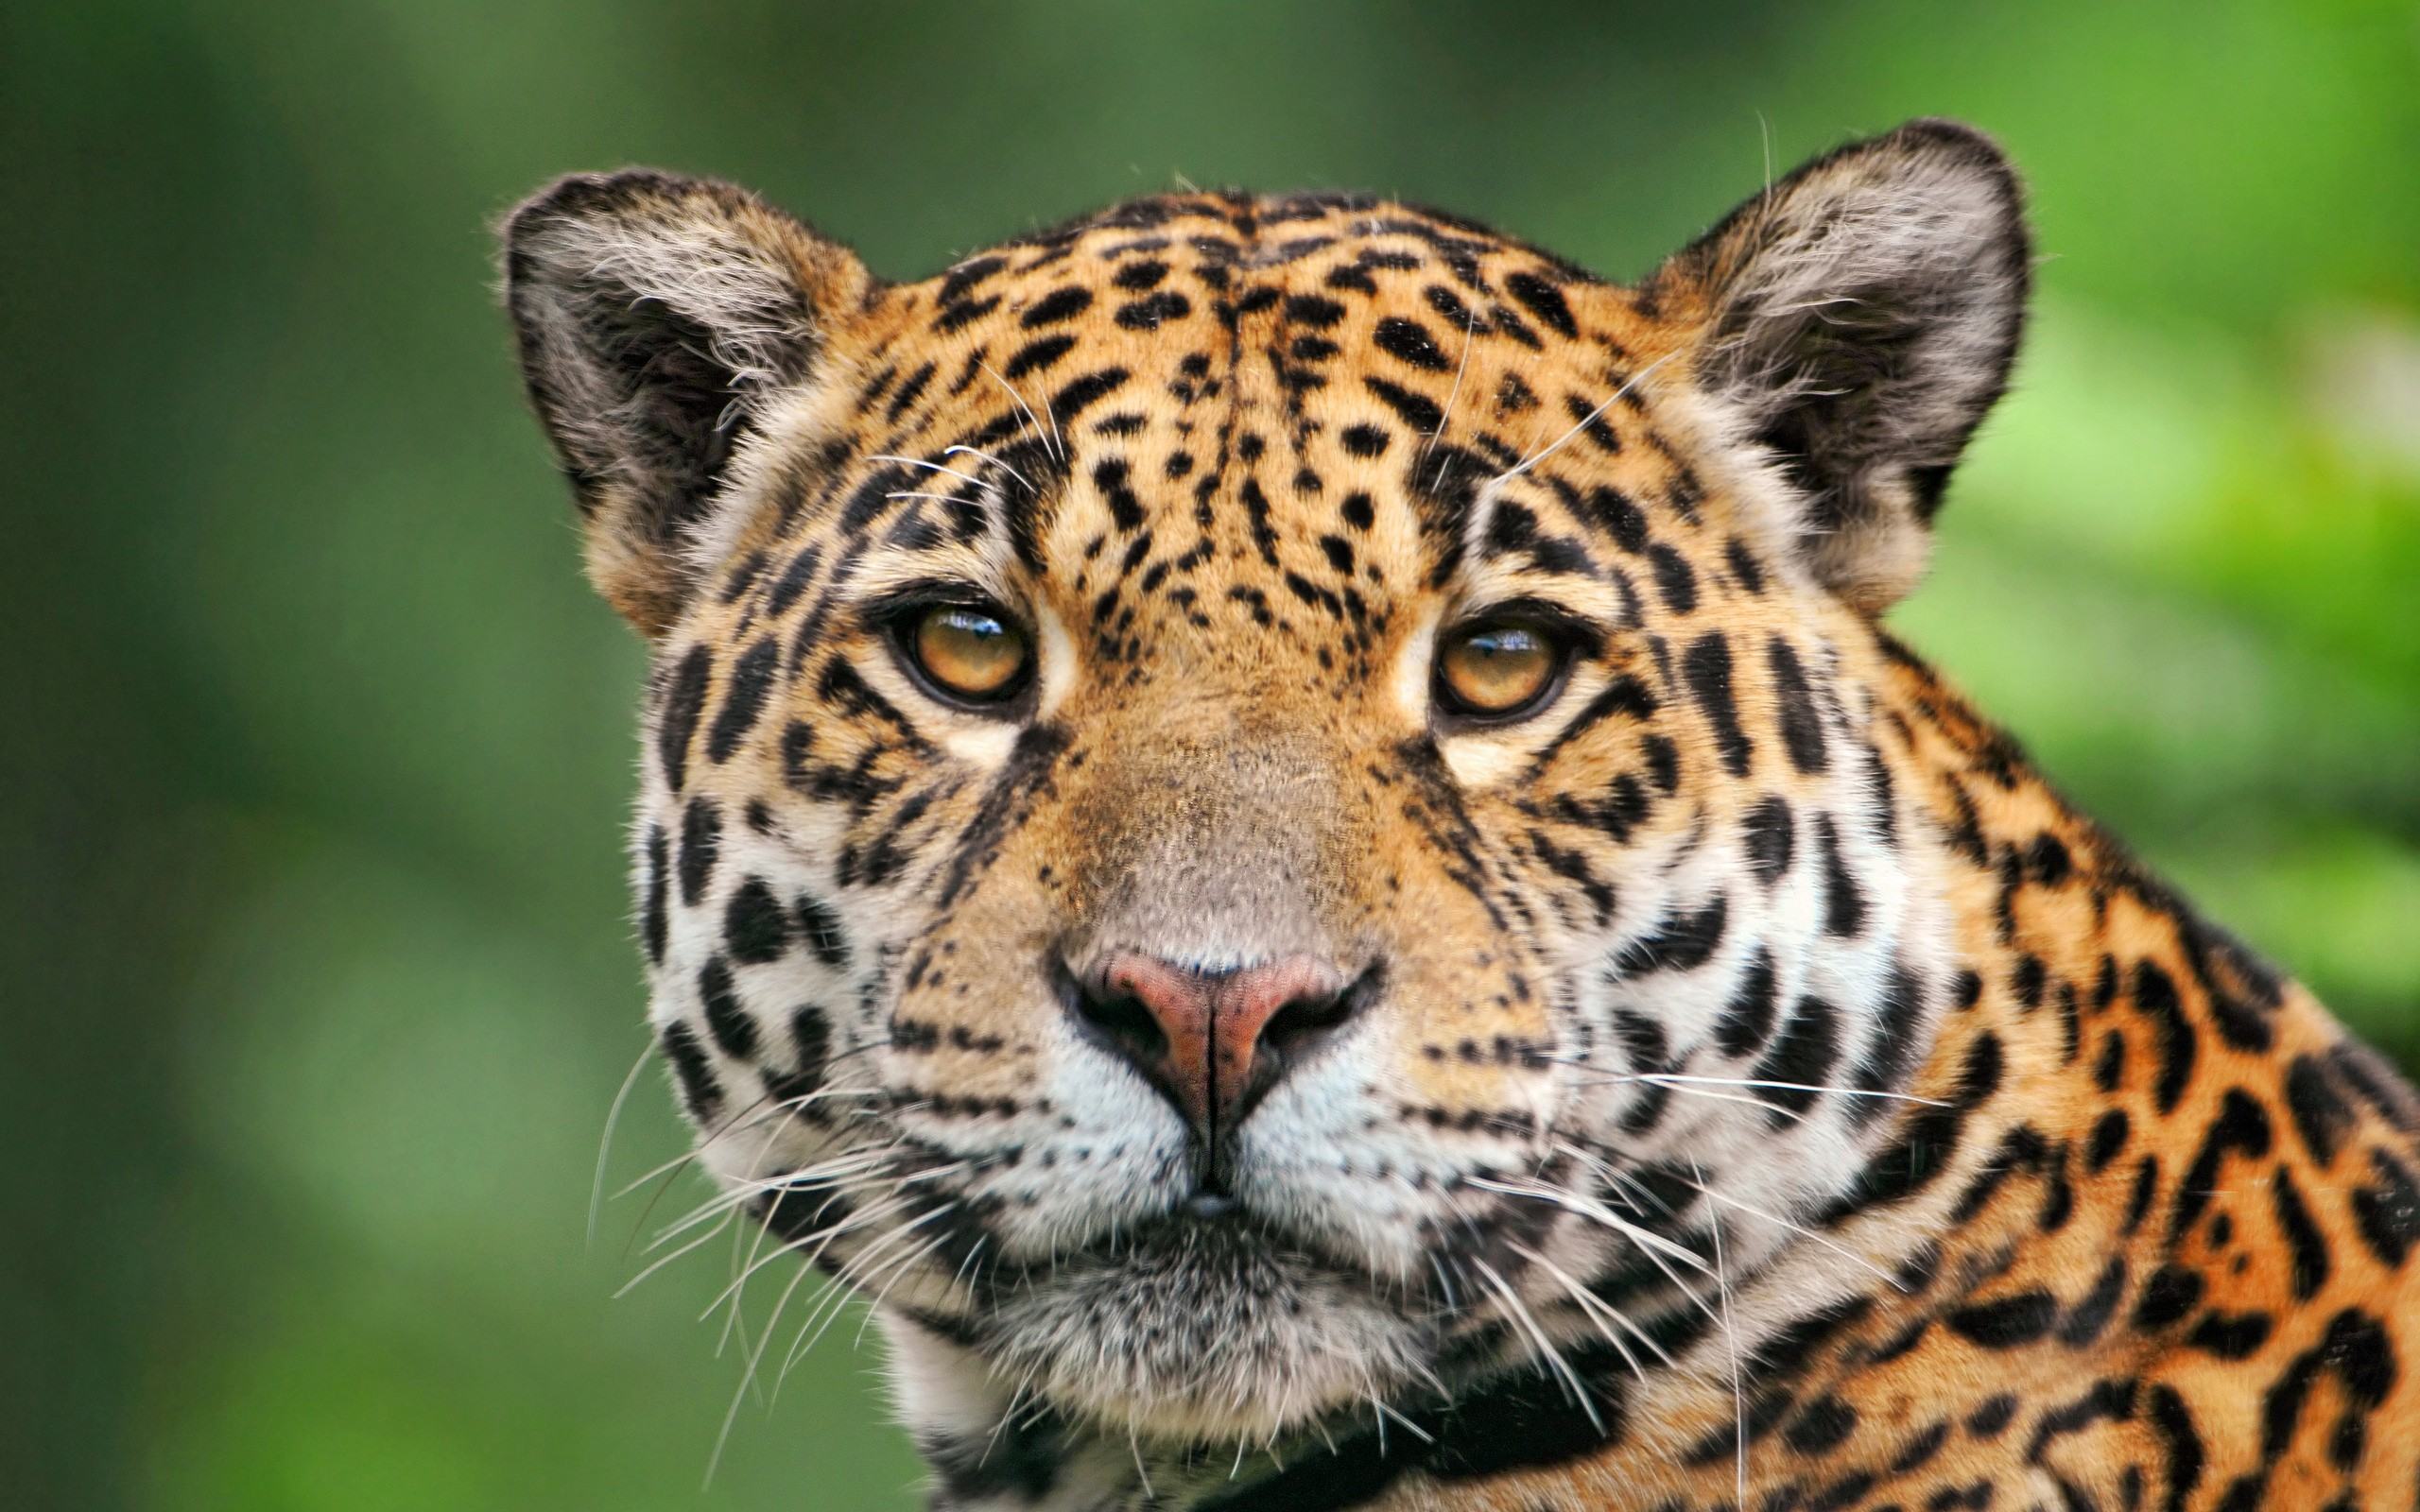 jaguar of the tropical rainforest wallpaper 2560x1600 2464 wallpaperup. Black Bedroom Furniture Sets. Home Design Ideas